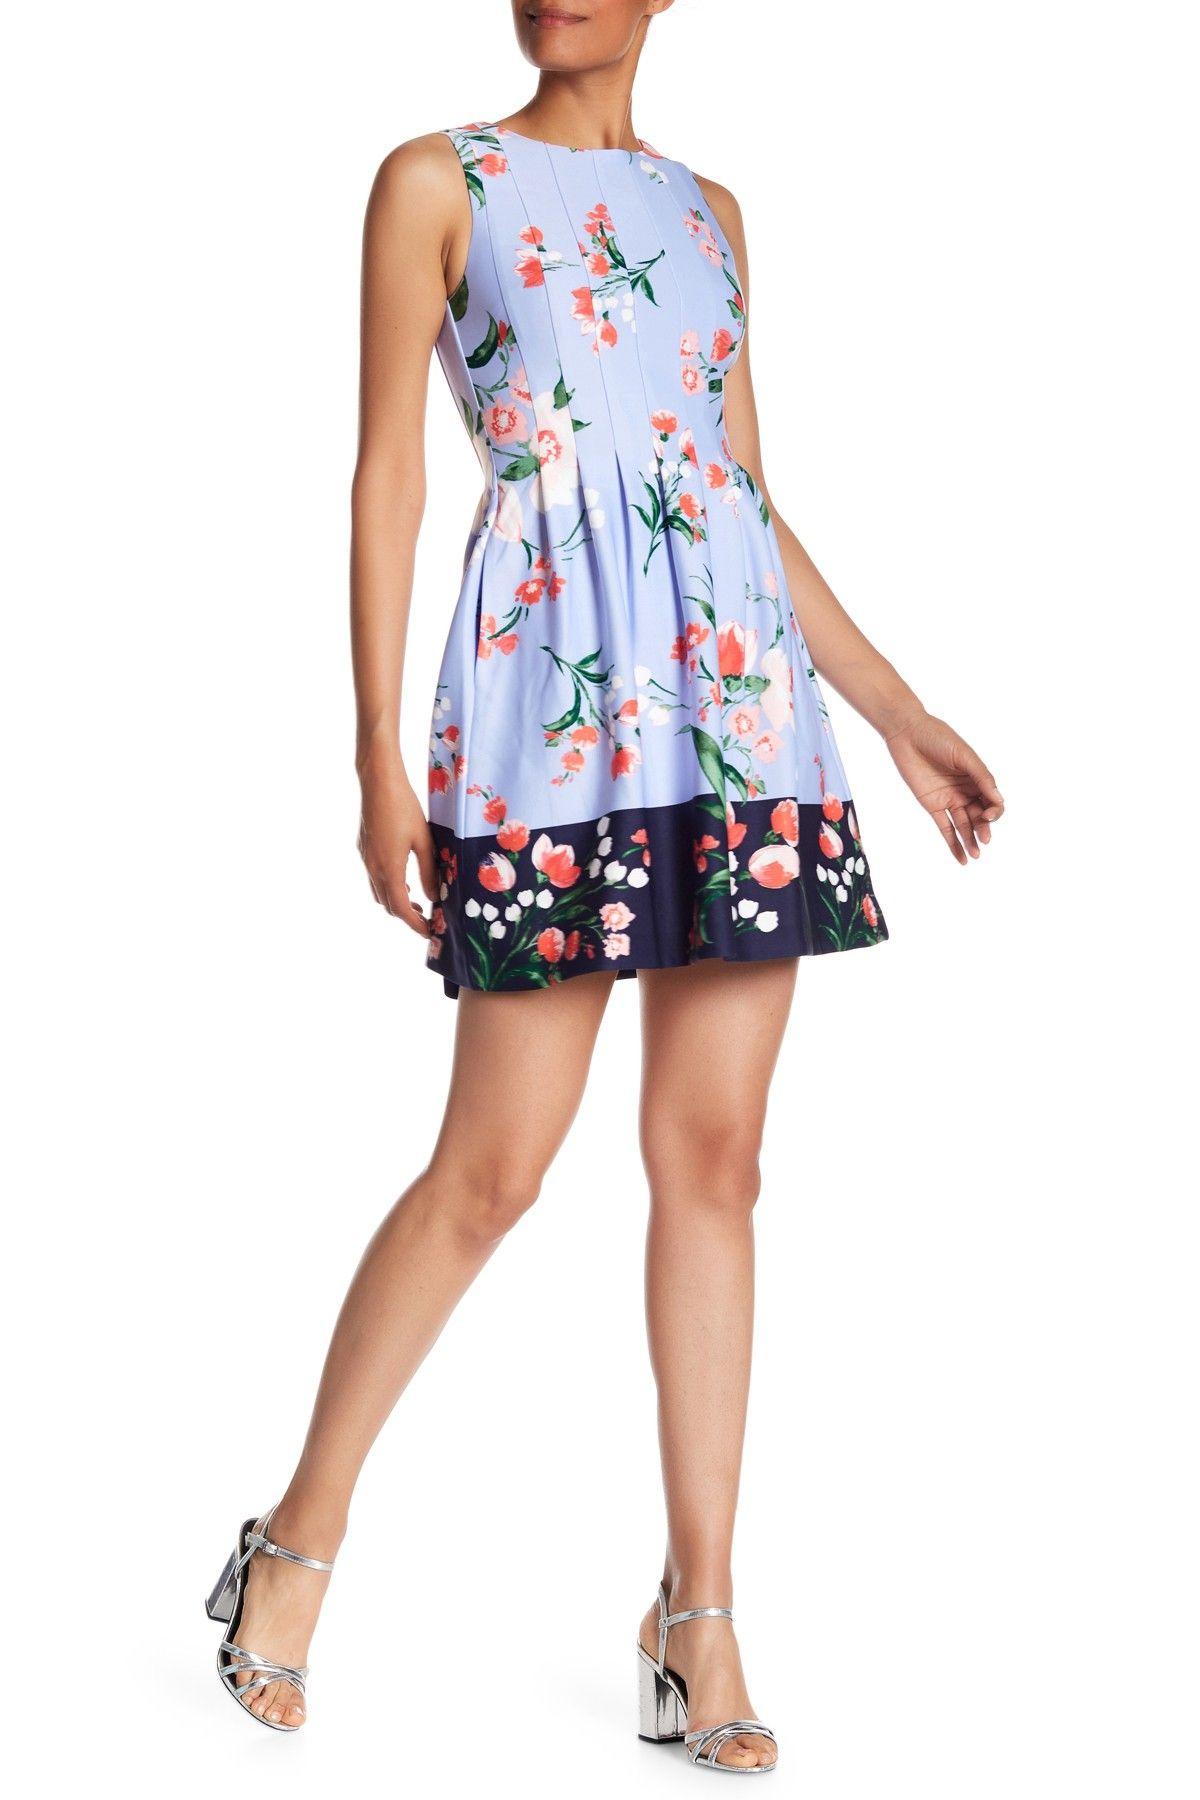 Floral Print Scuba Fit Flare Dress Fit Flare Dress Dresses Fit Flare [ 1800 x 1200 Pixel ]